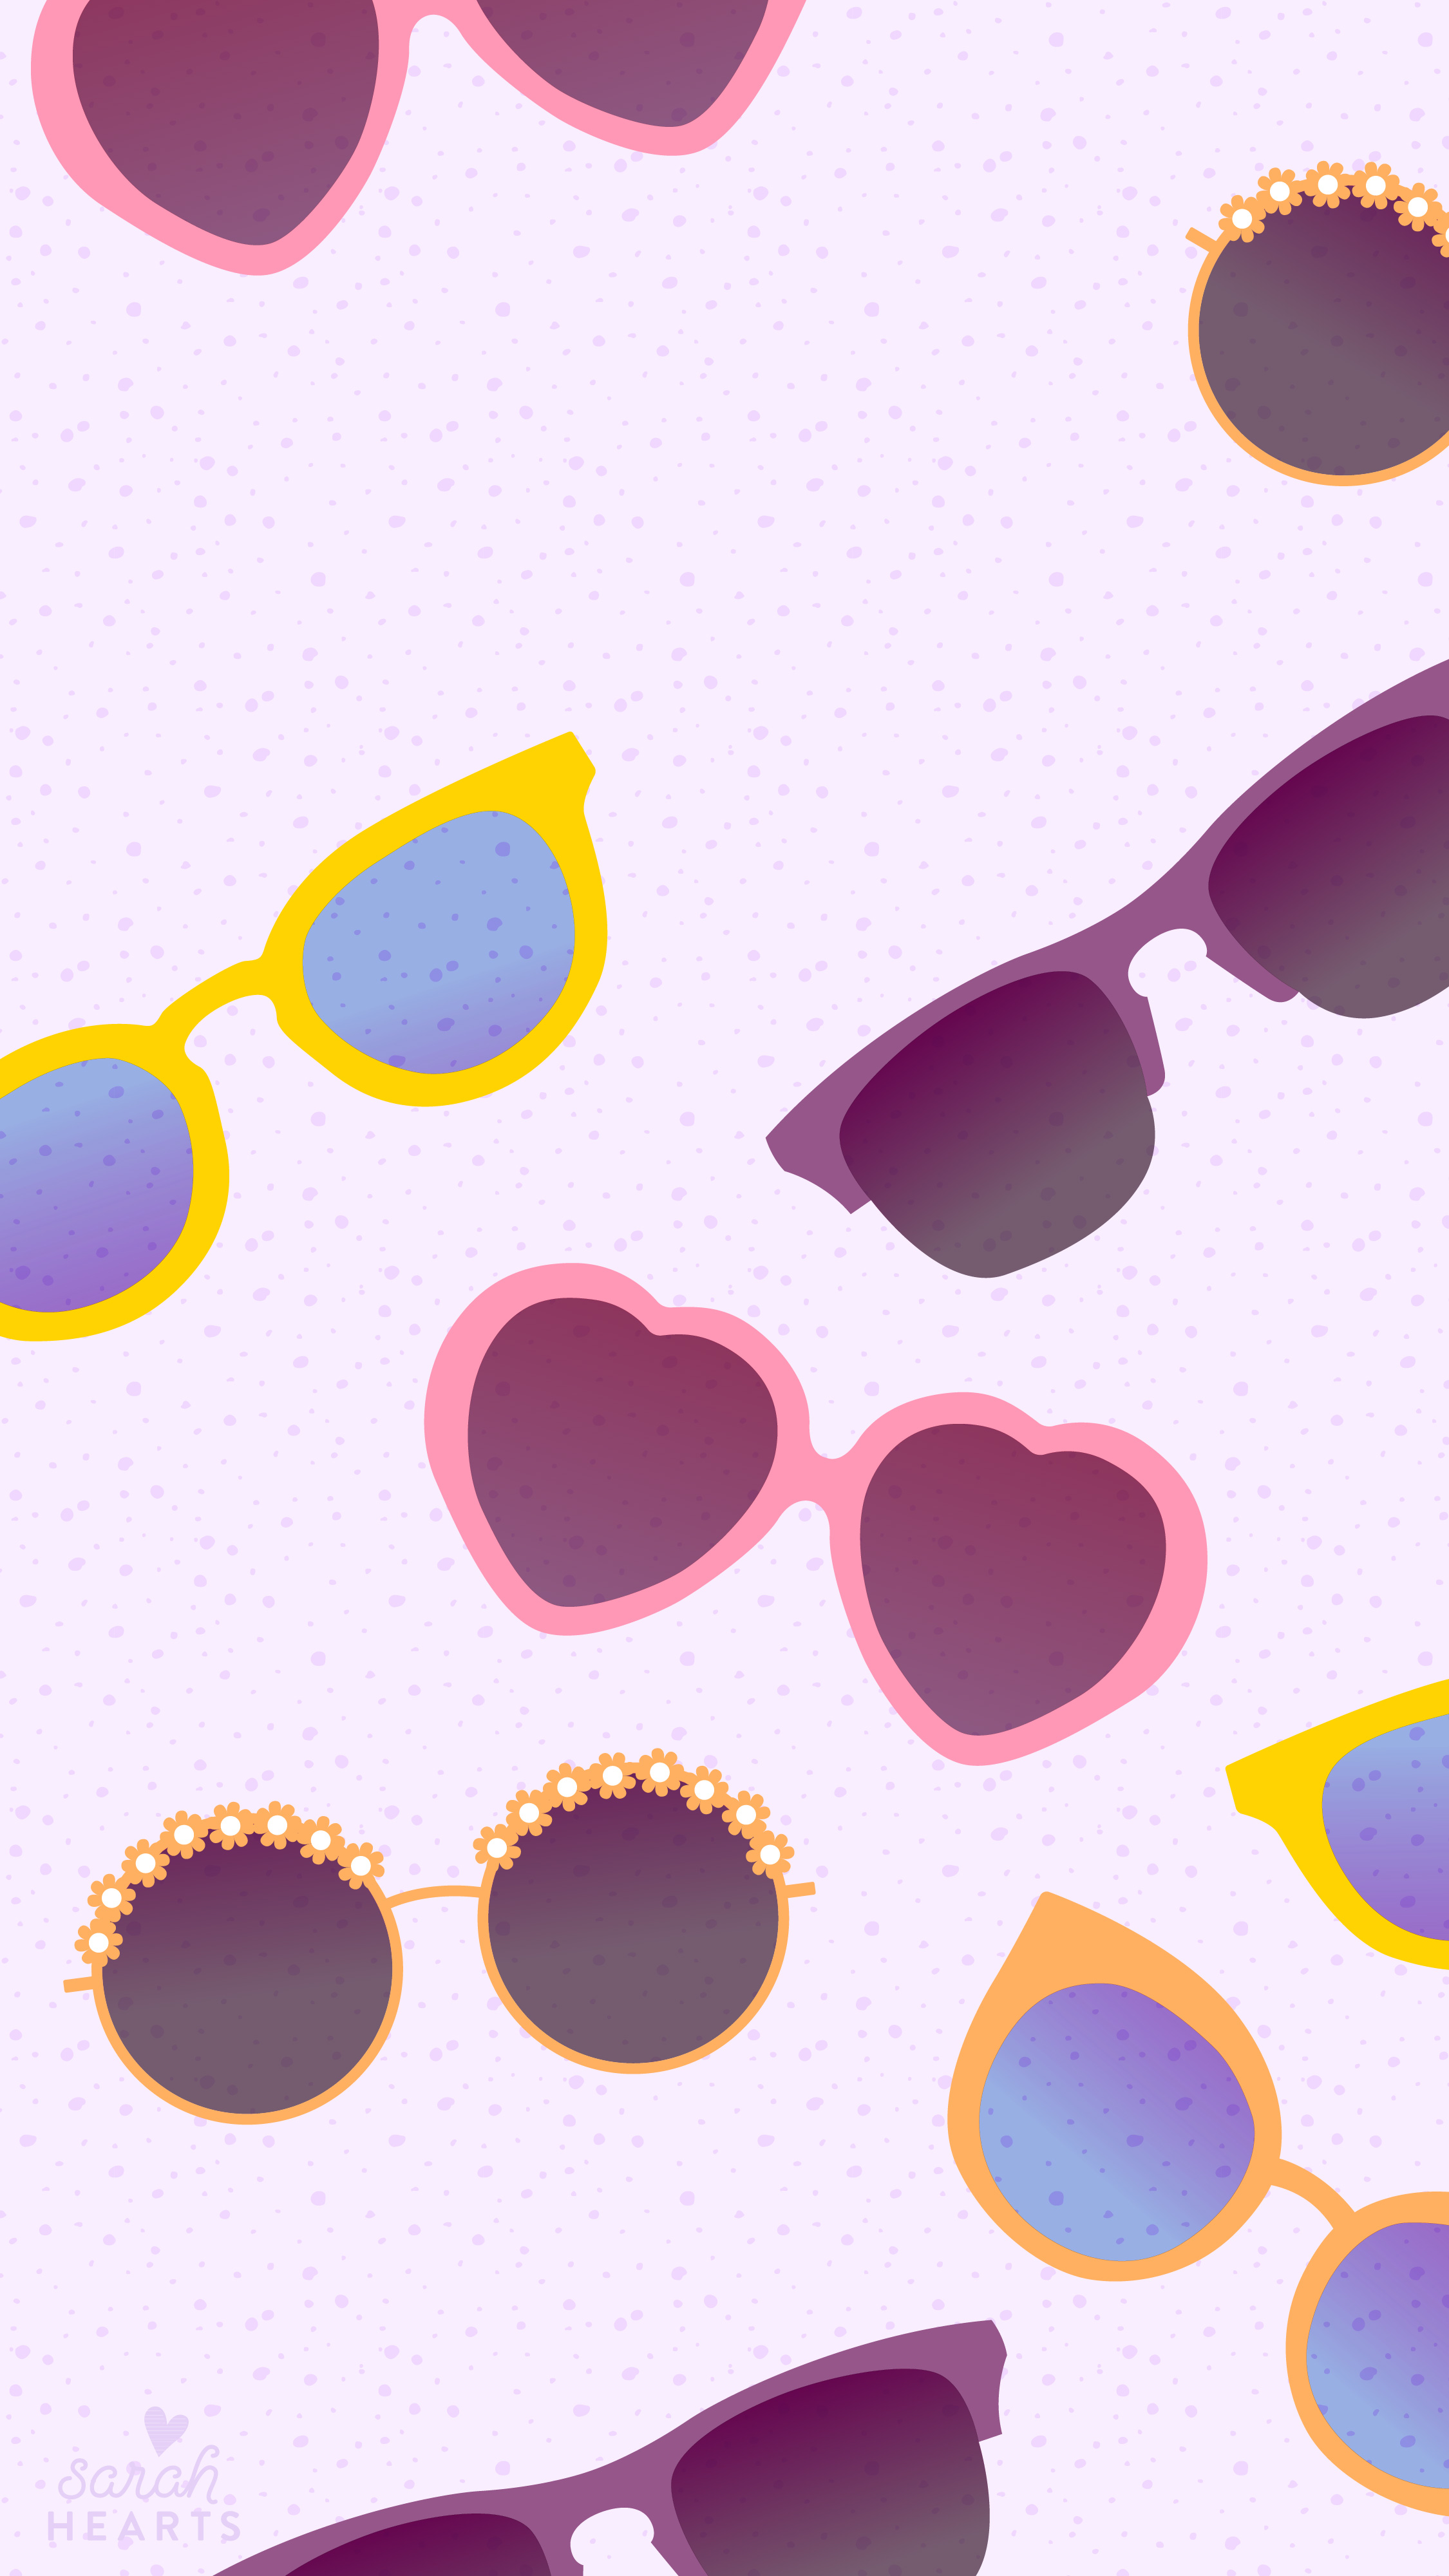 june 2016 sunglasses calendar wallpaper sarah hearts